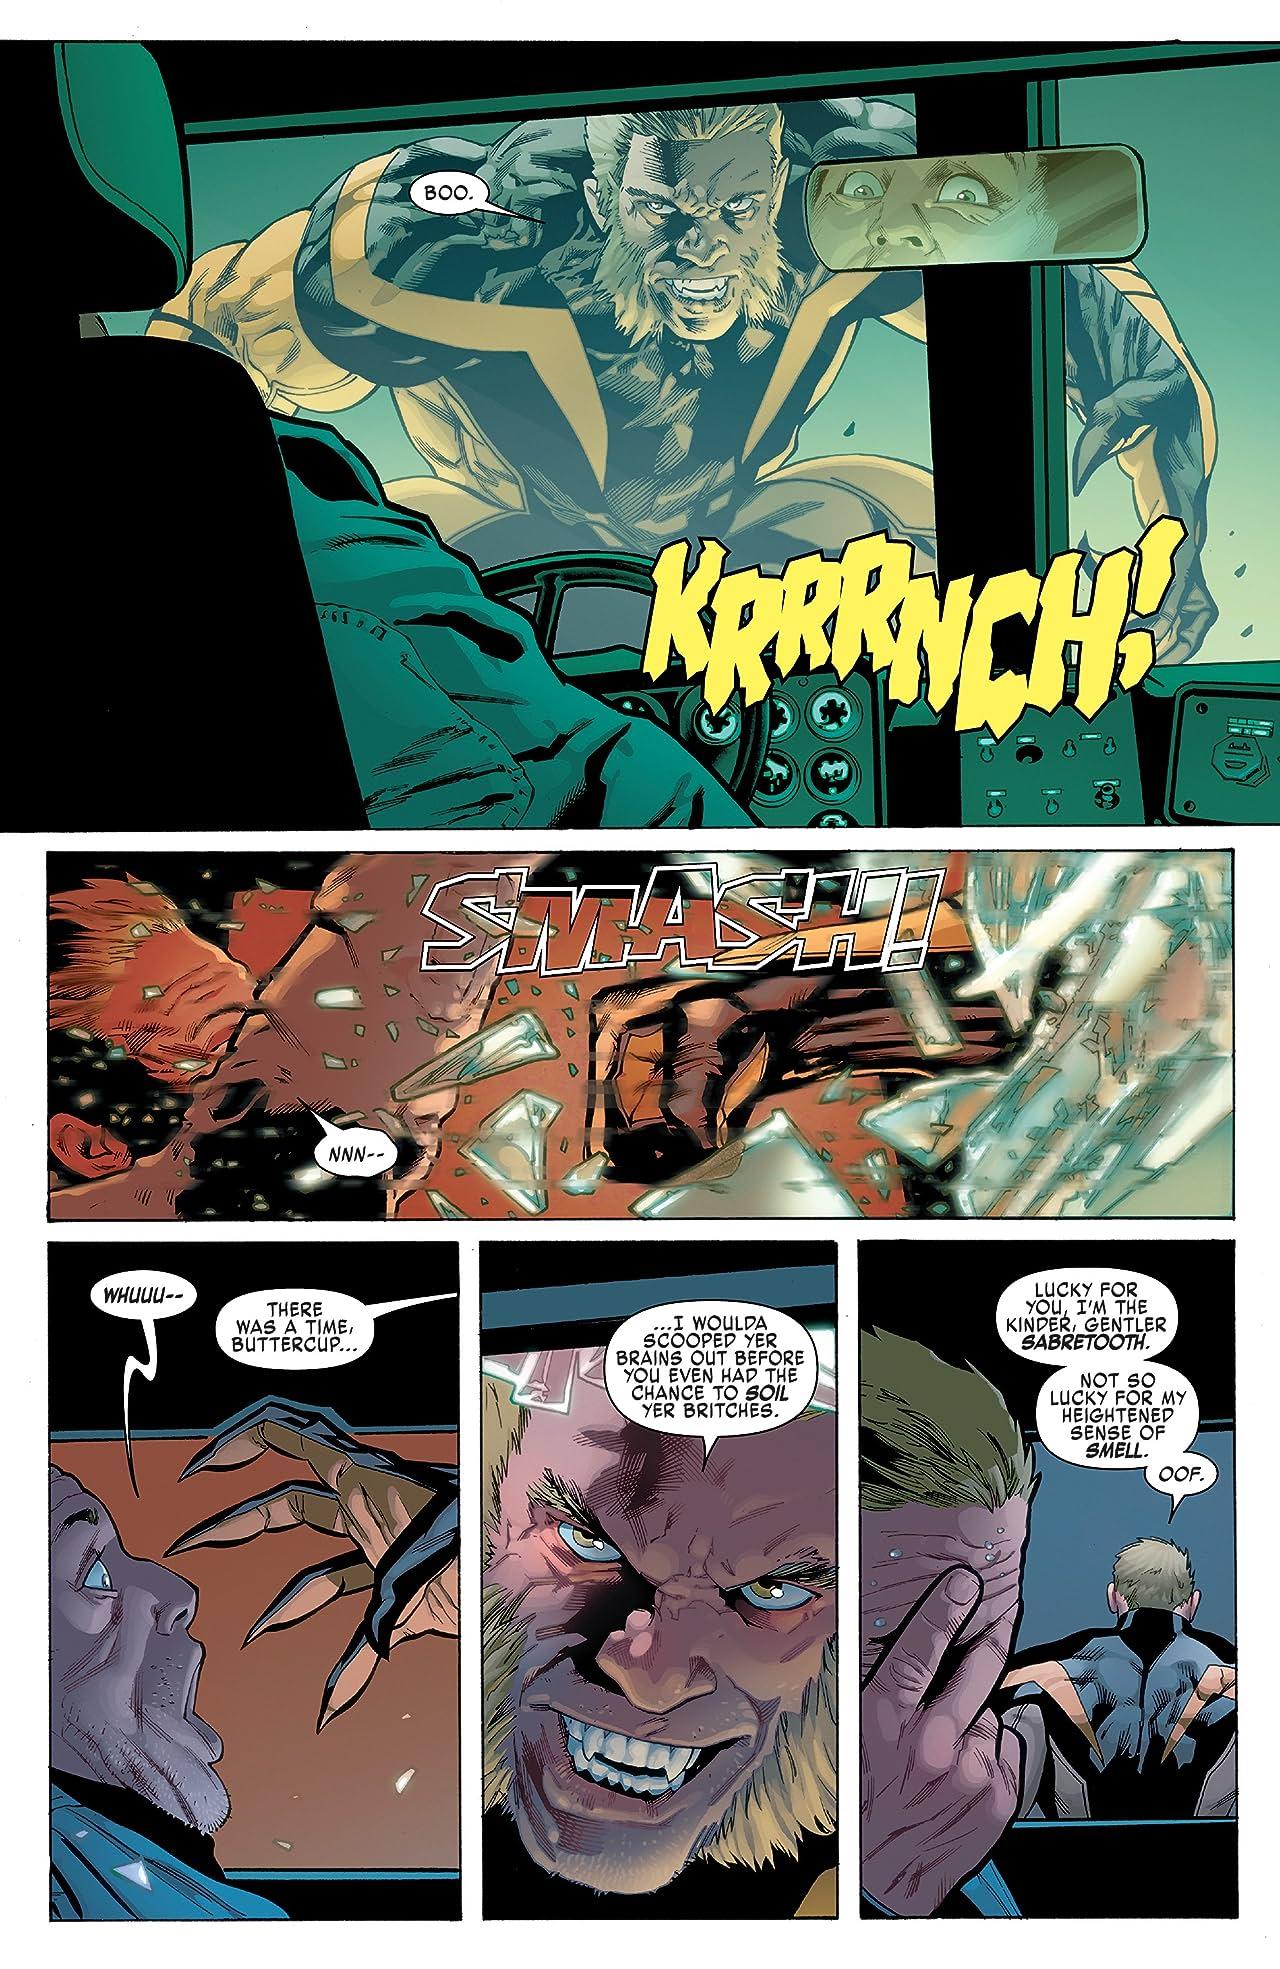 Uncanny X-Men: Superior Vol. 1: Survival of the Fittest